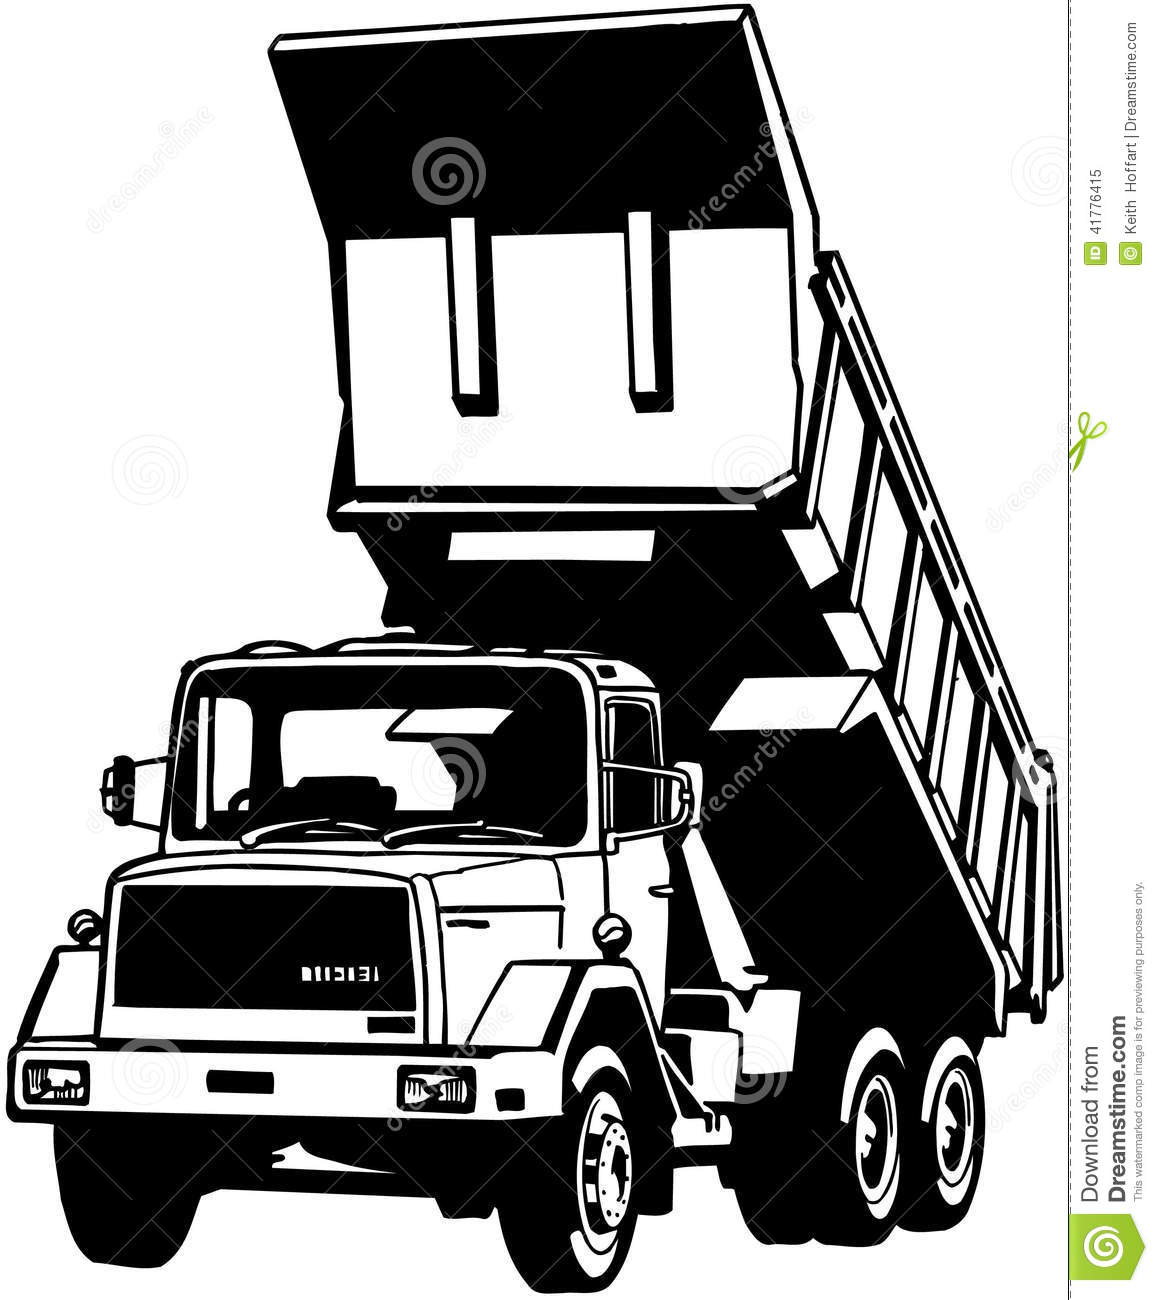 13 Dump Truck Vector Art Images